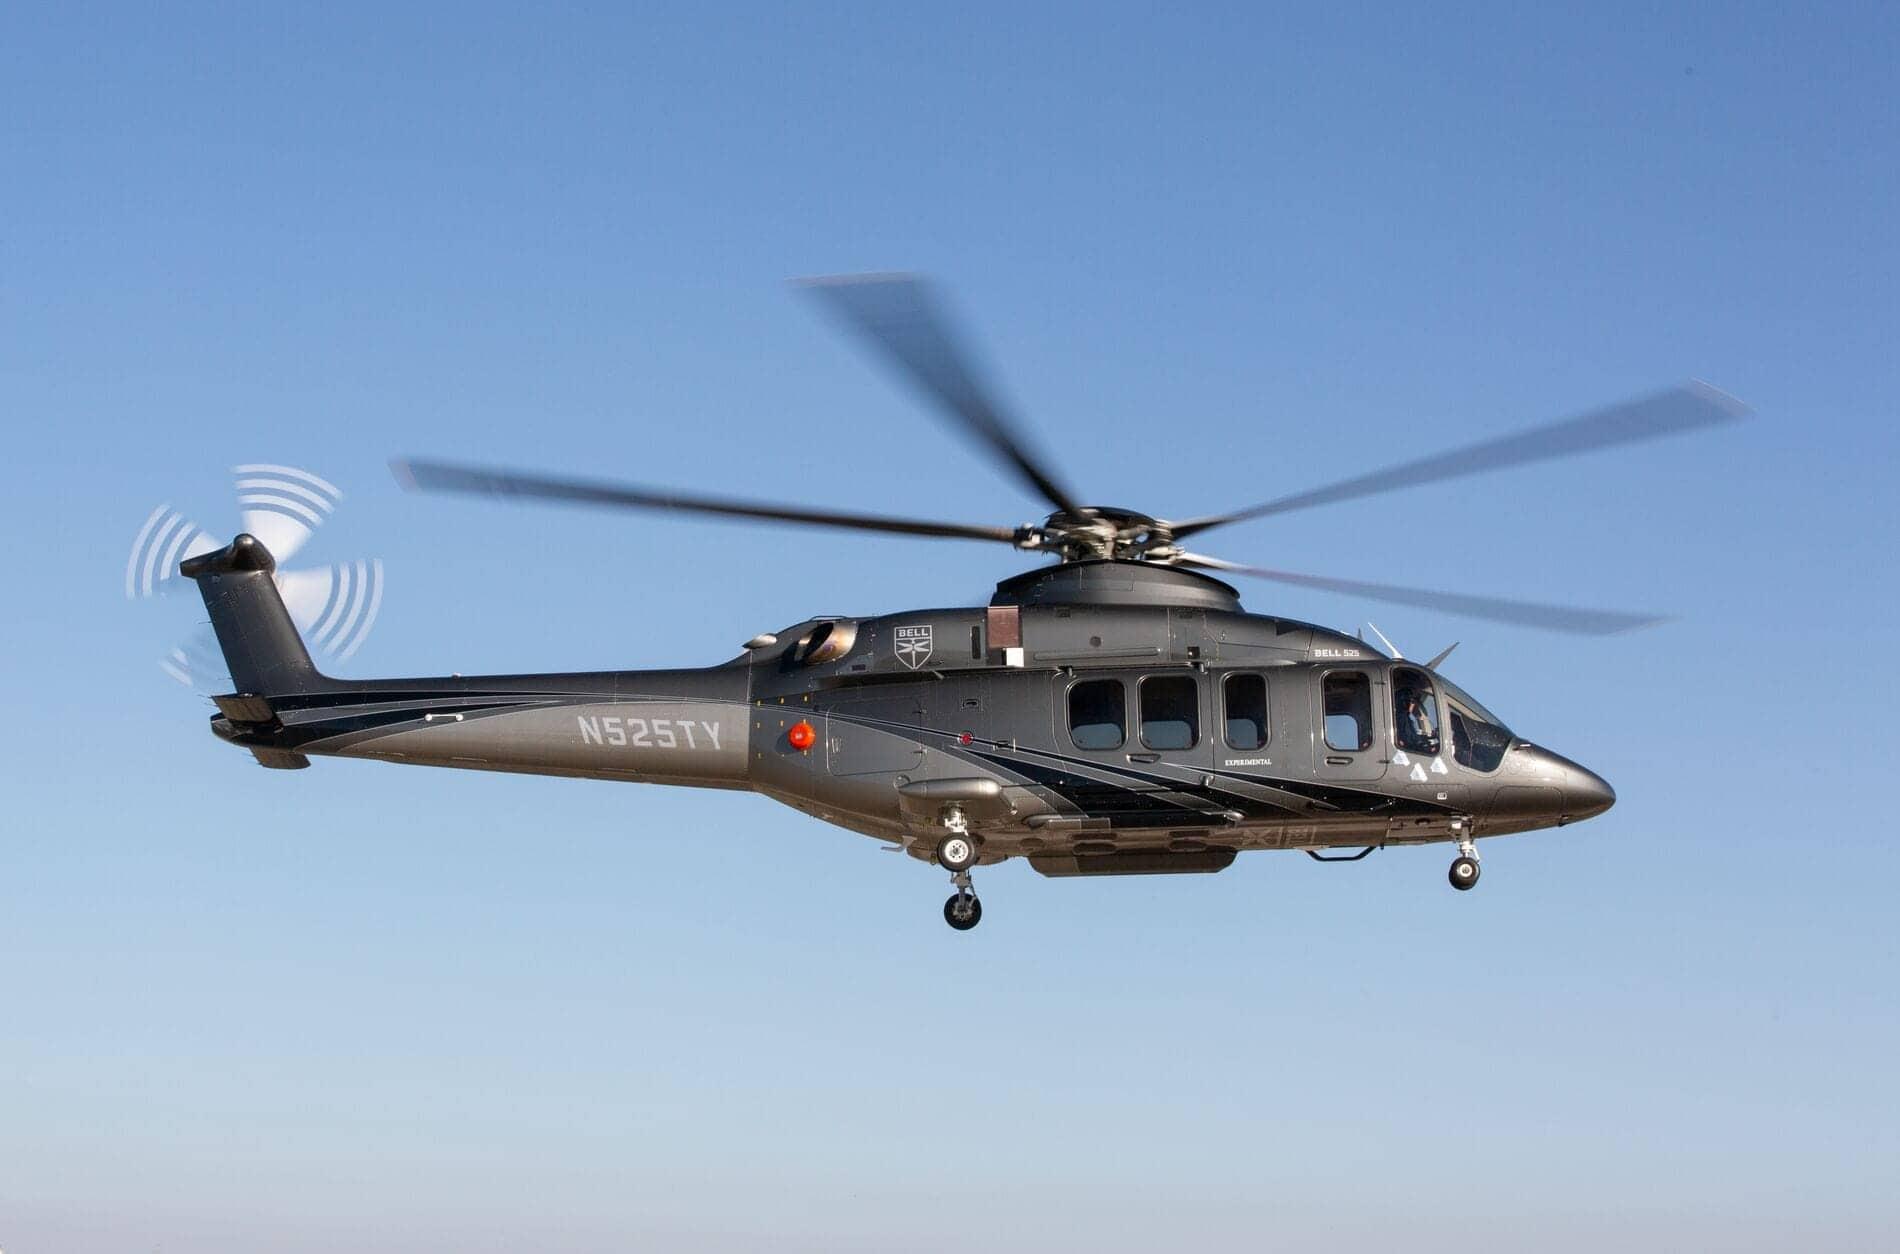 Vista de perfil del Bell 525 en vuelo